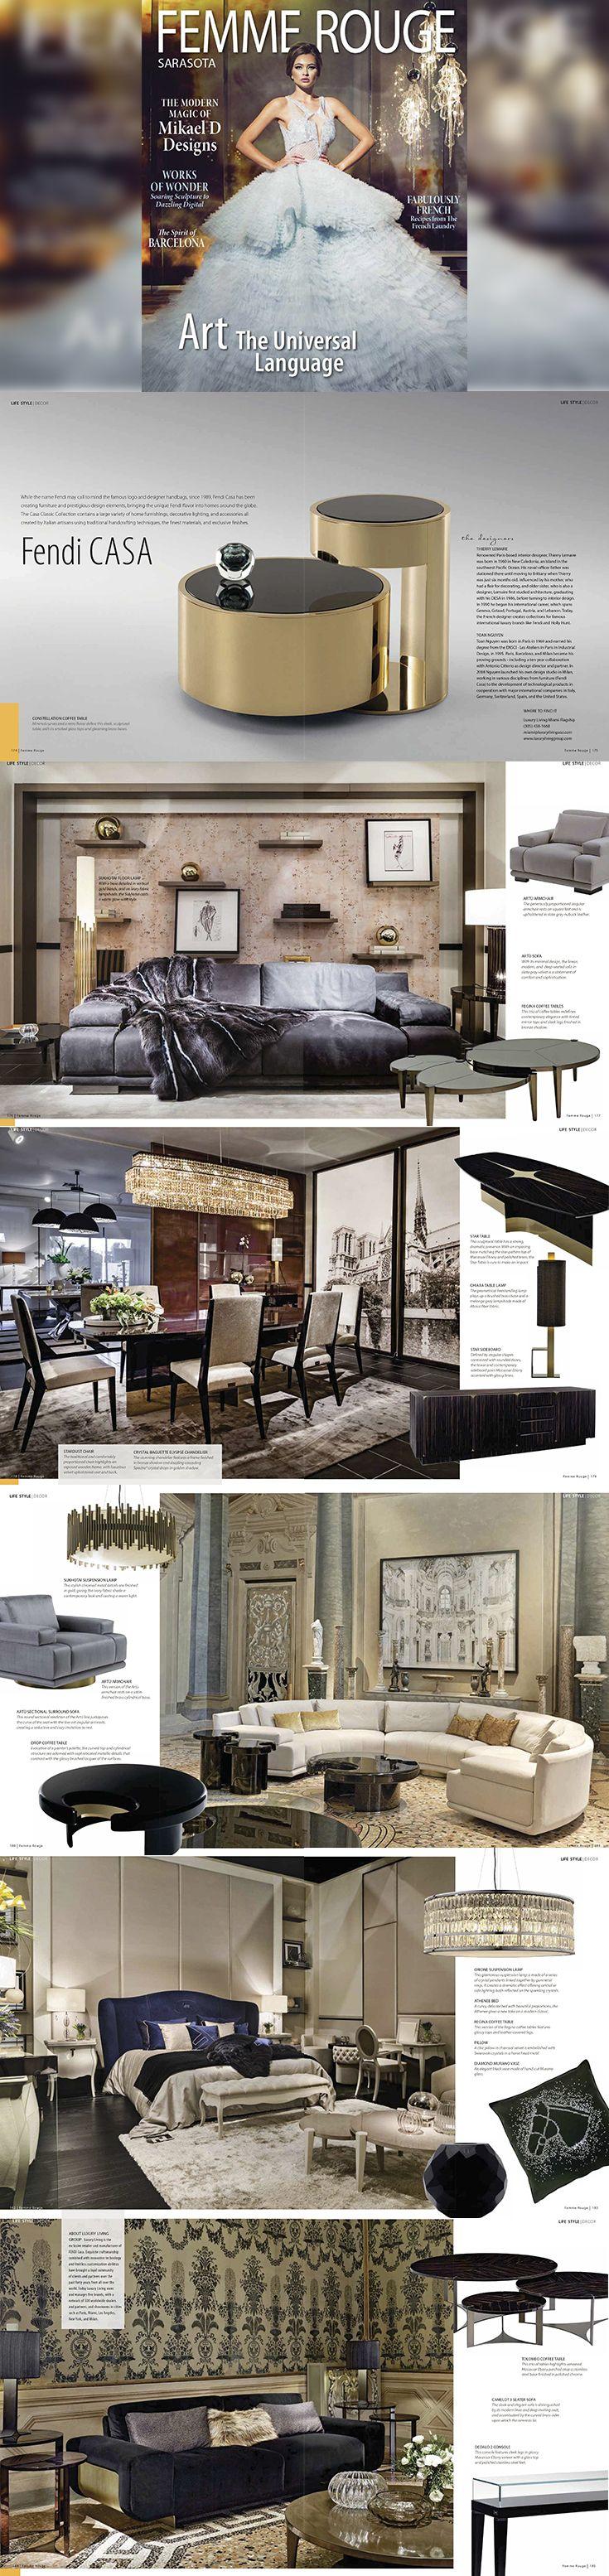 The 137 best FENDI CASA 芬迪 images on Pinterest   Furniture, Luxury ...